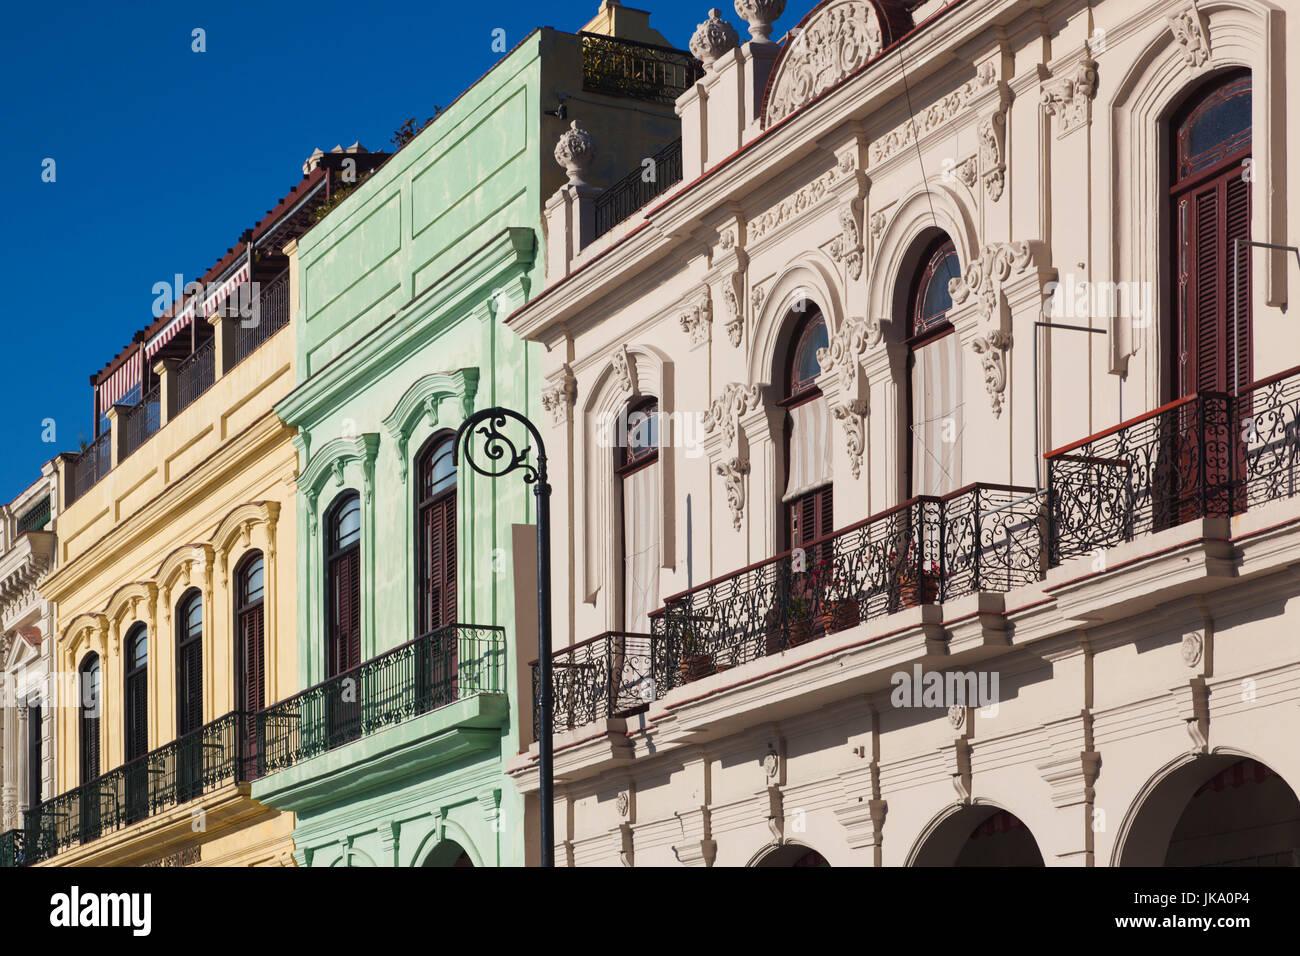 Cuba, Havana, Havana Vieja, harborfront buidings - Stock Image